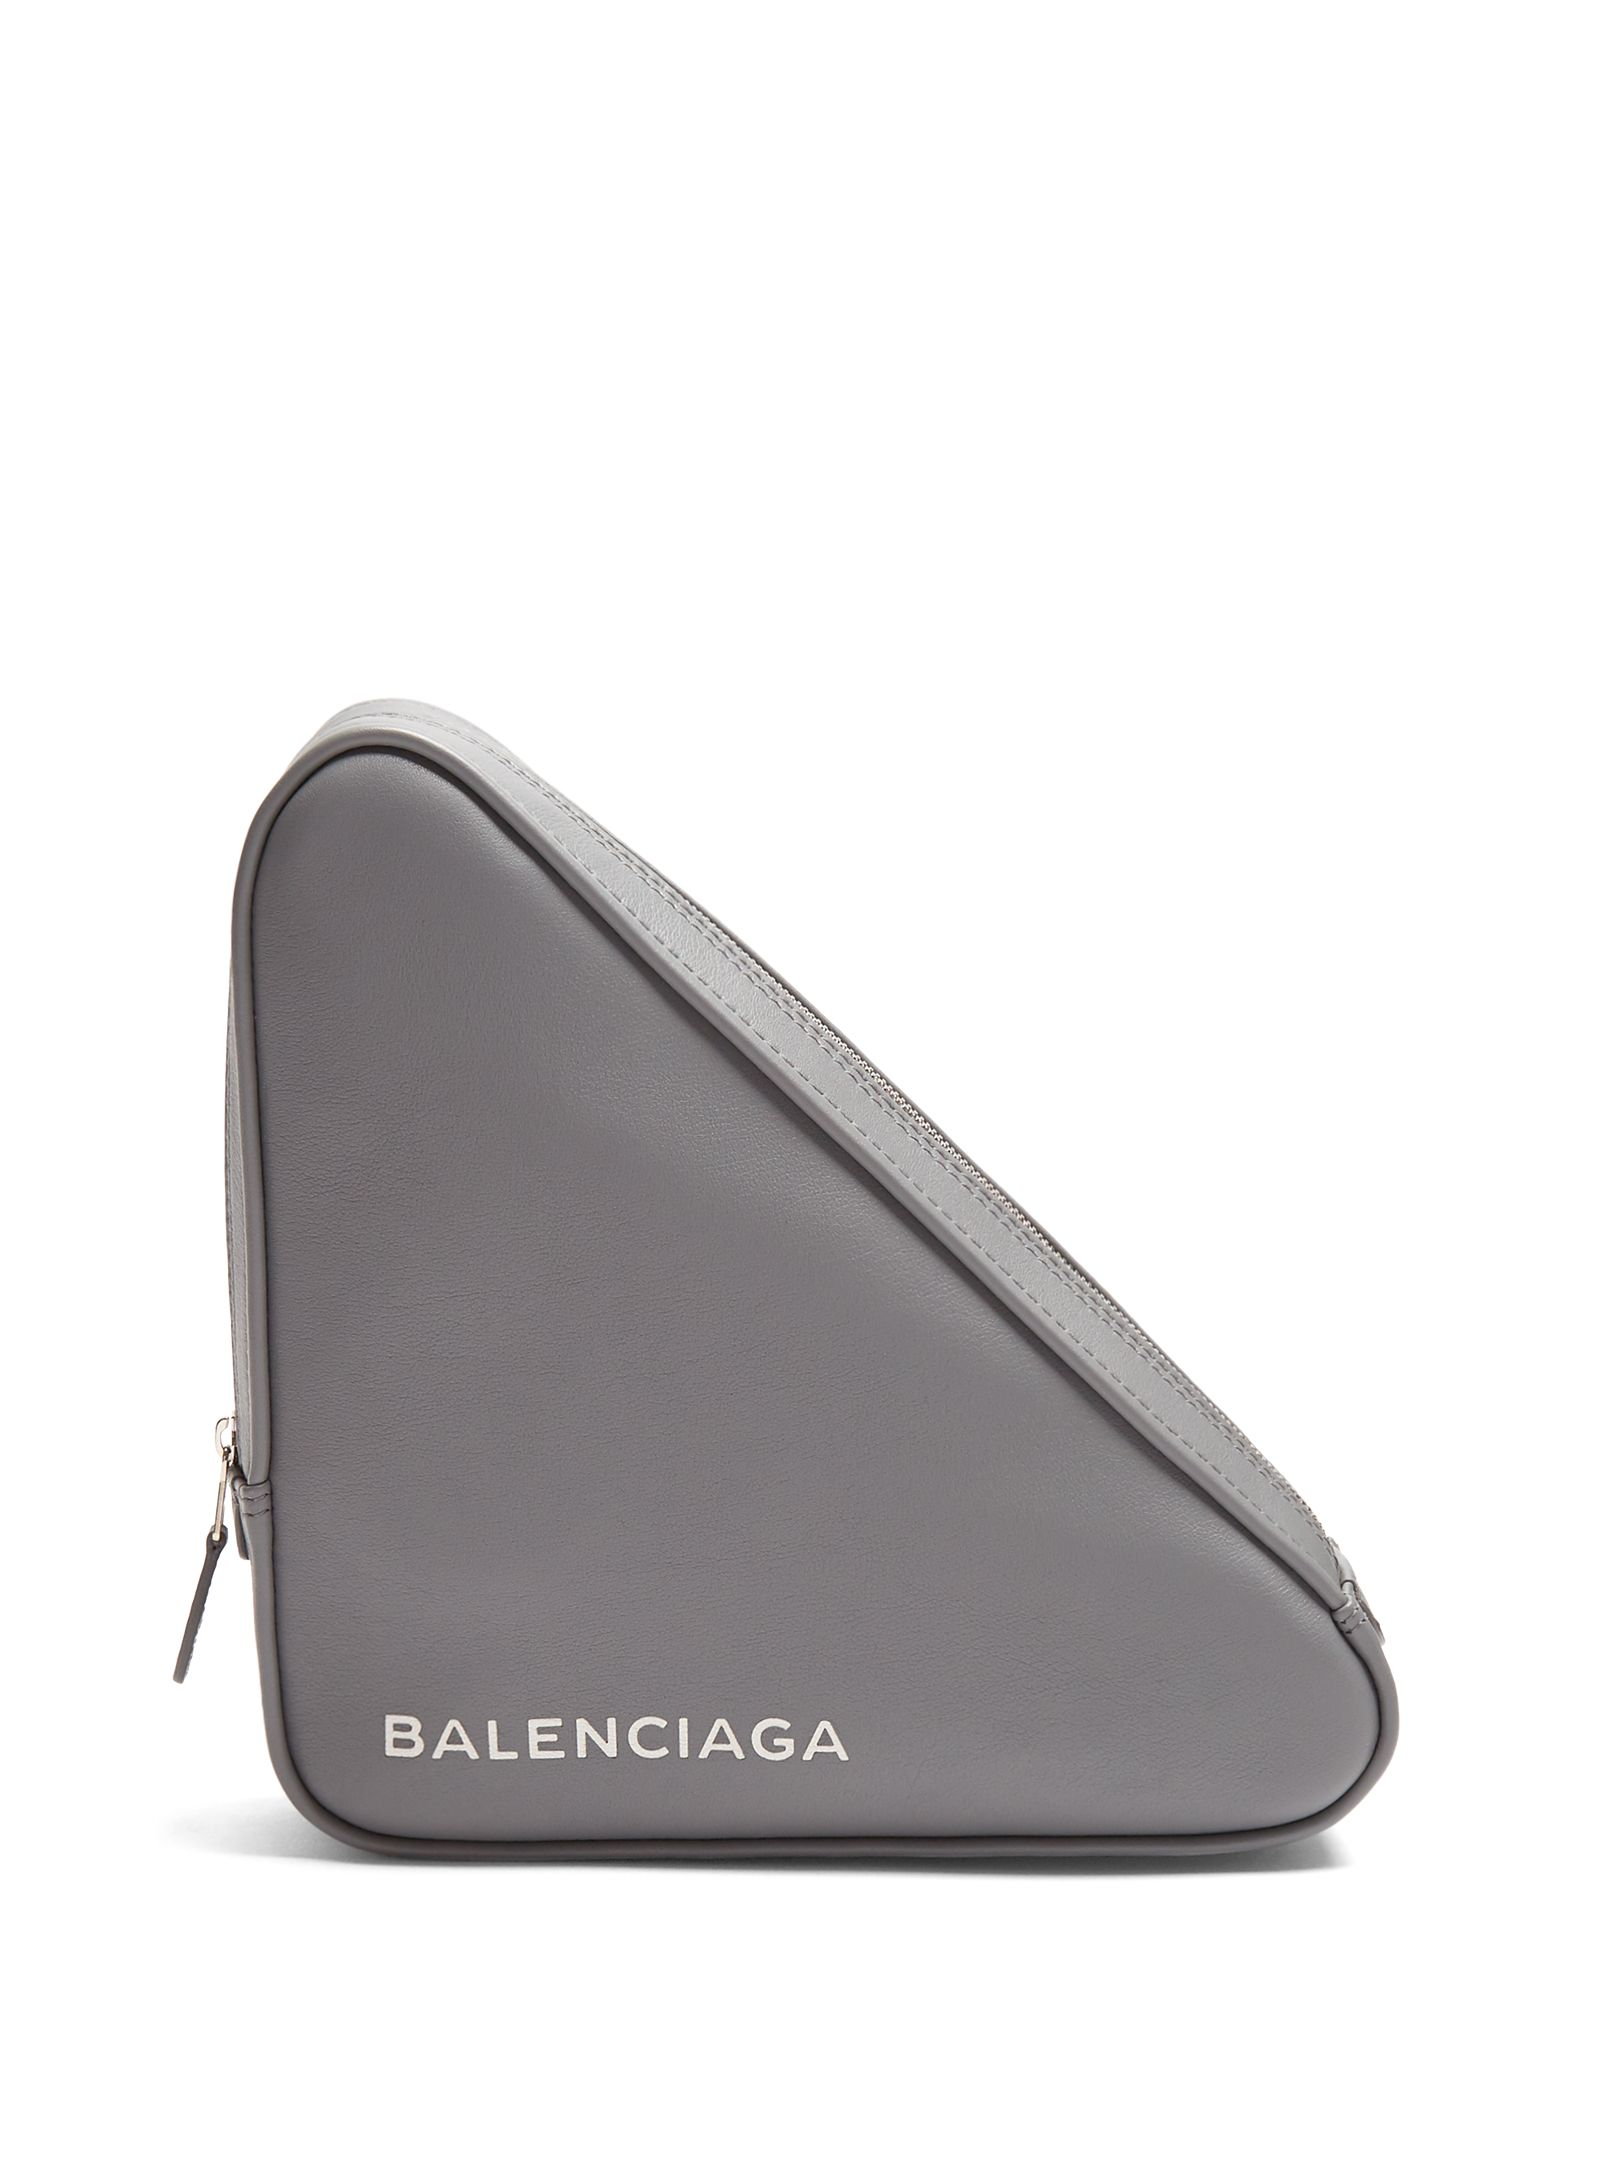 Triangle Pochette M clutch Balenciaga NlJqYgMhT